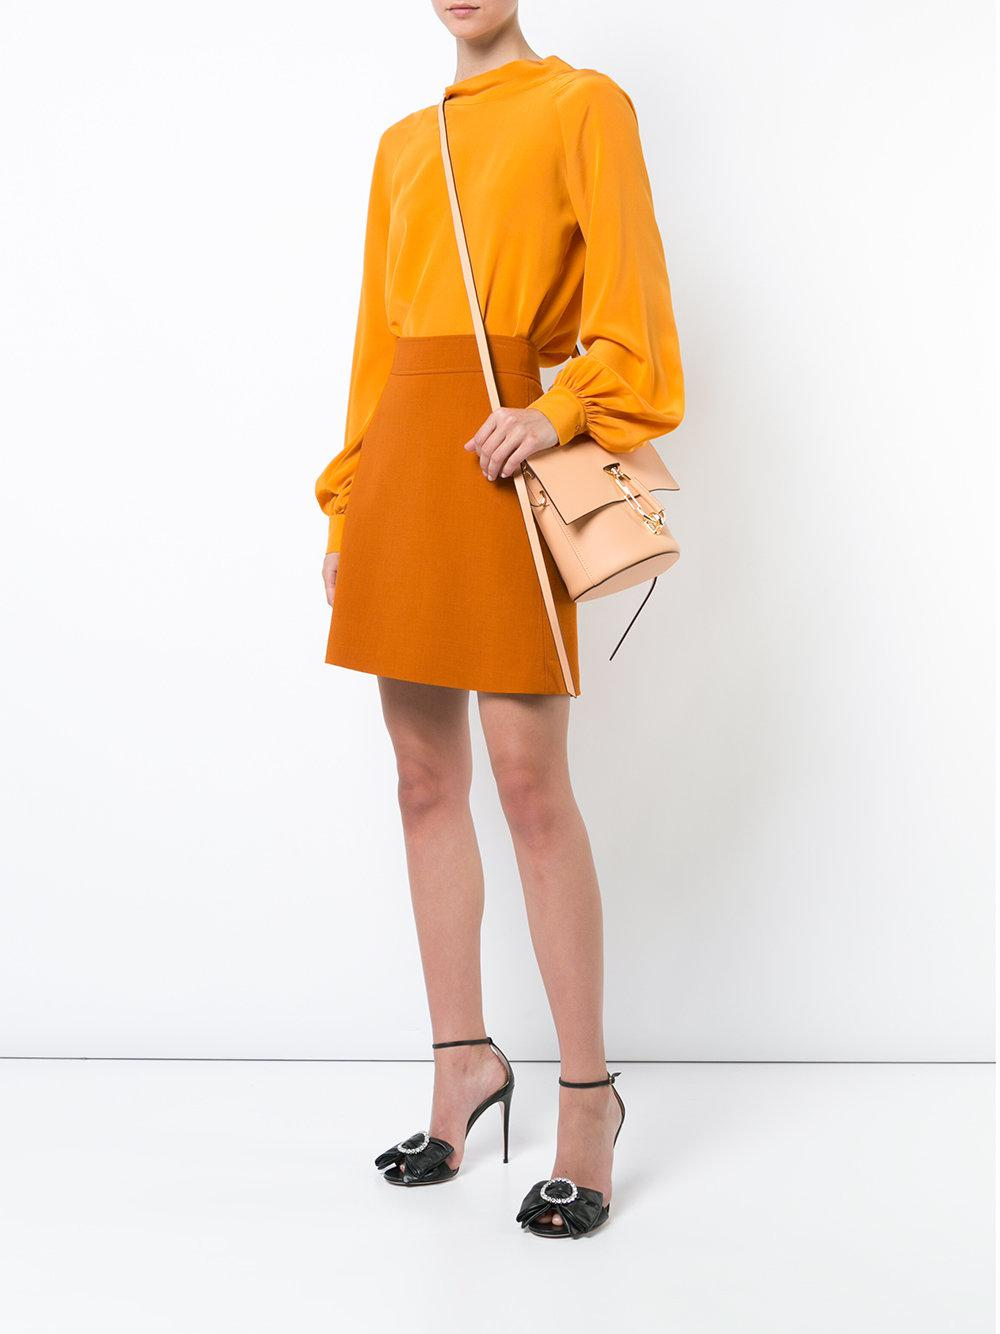 Zac Zac Posen Leather Belay Crossbody - Solid in Yellow & Orange (Natural)